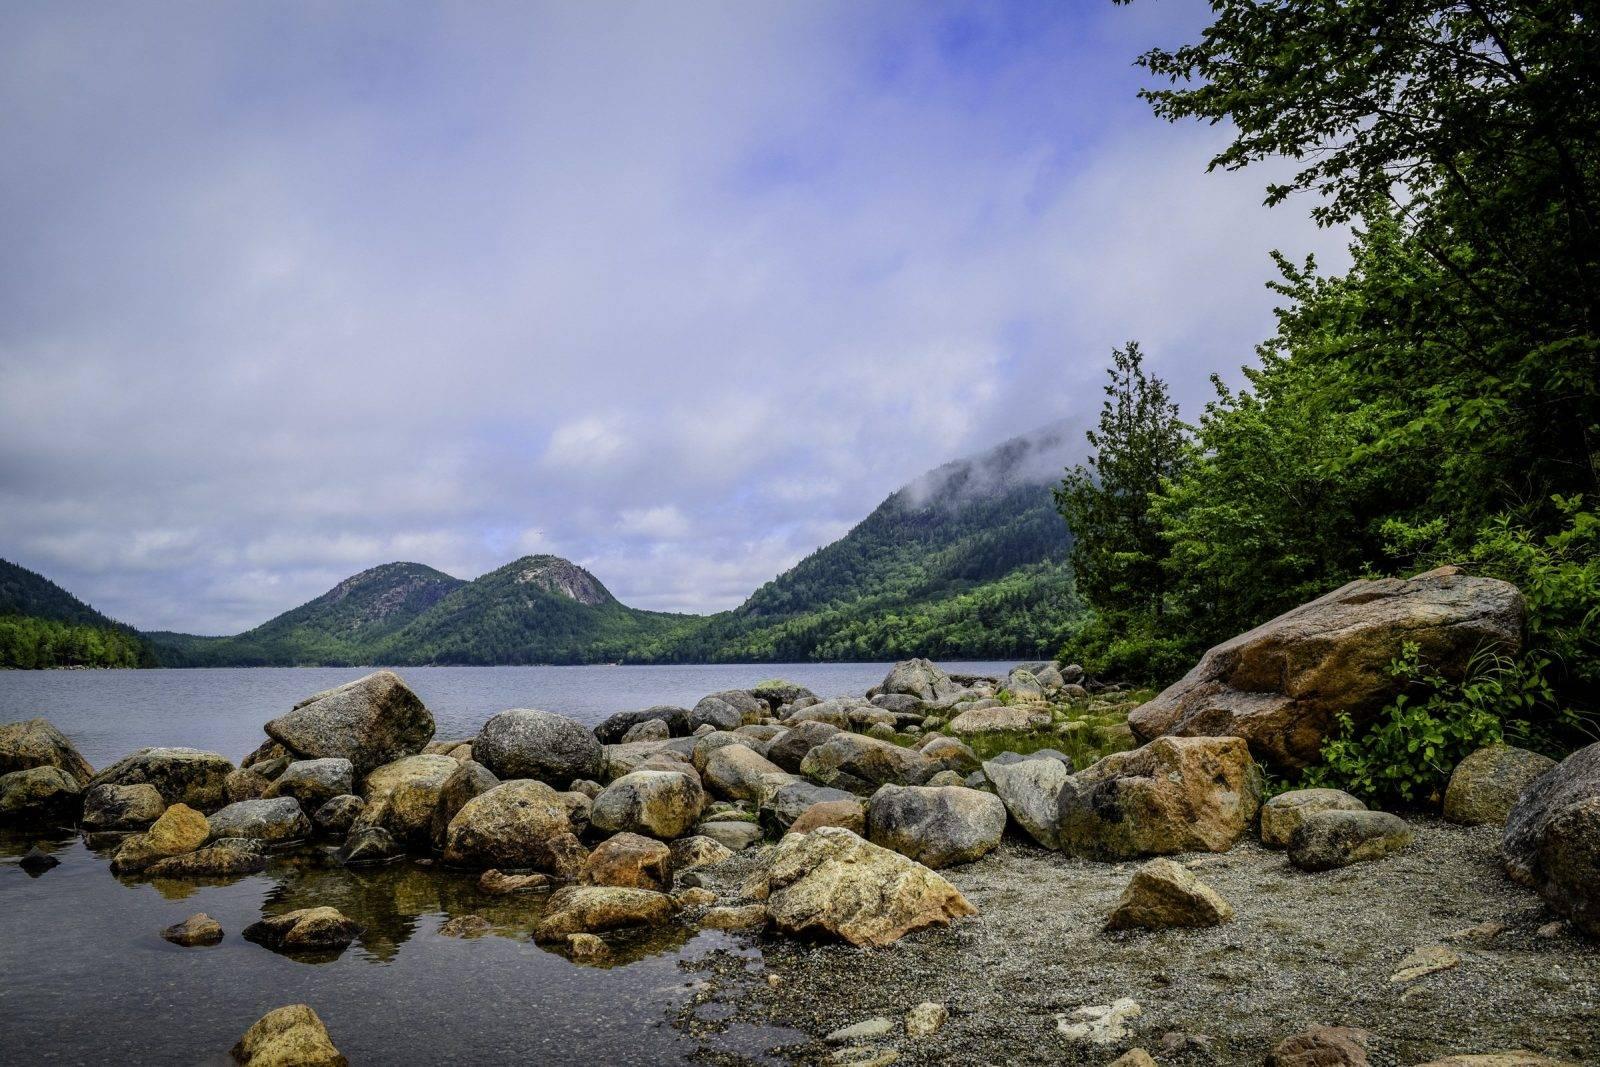 DSC 0786 - Acadia National Park